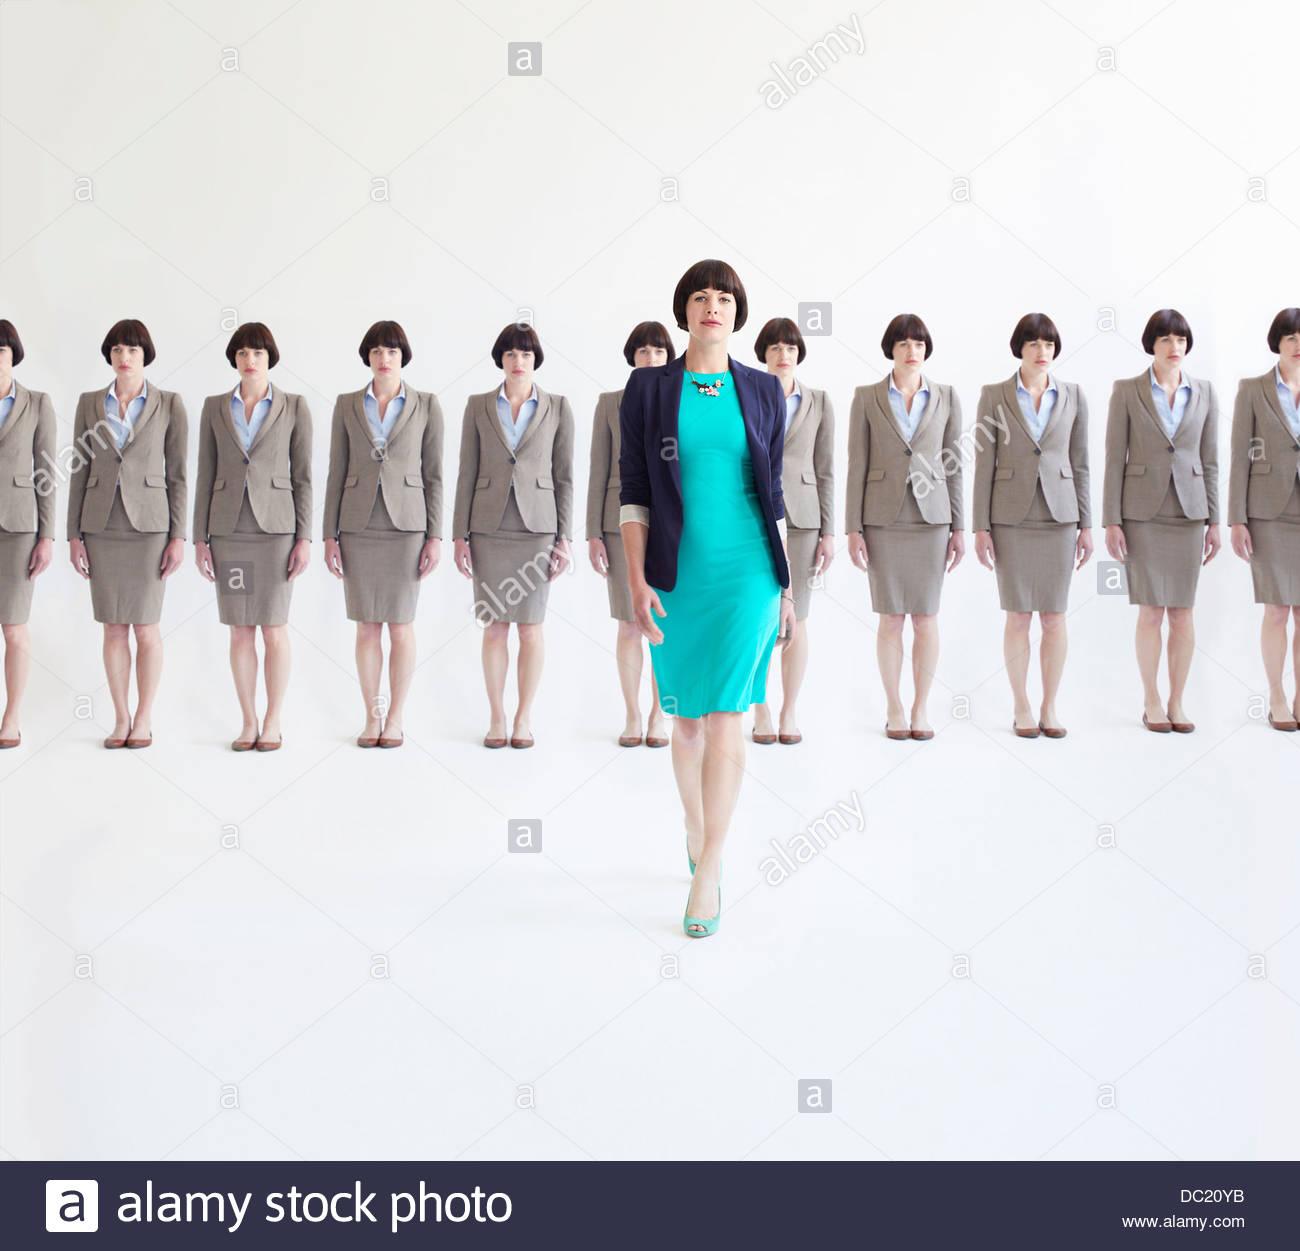 Businesswoman walking away from line of identical women, studio shot - Stock Image